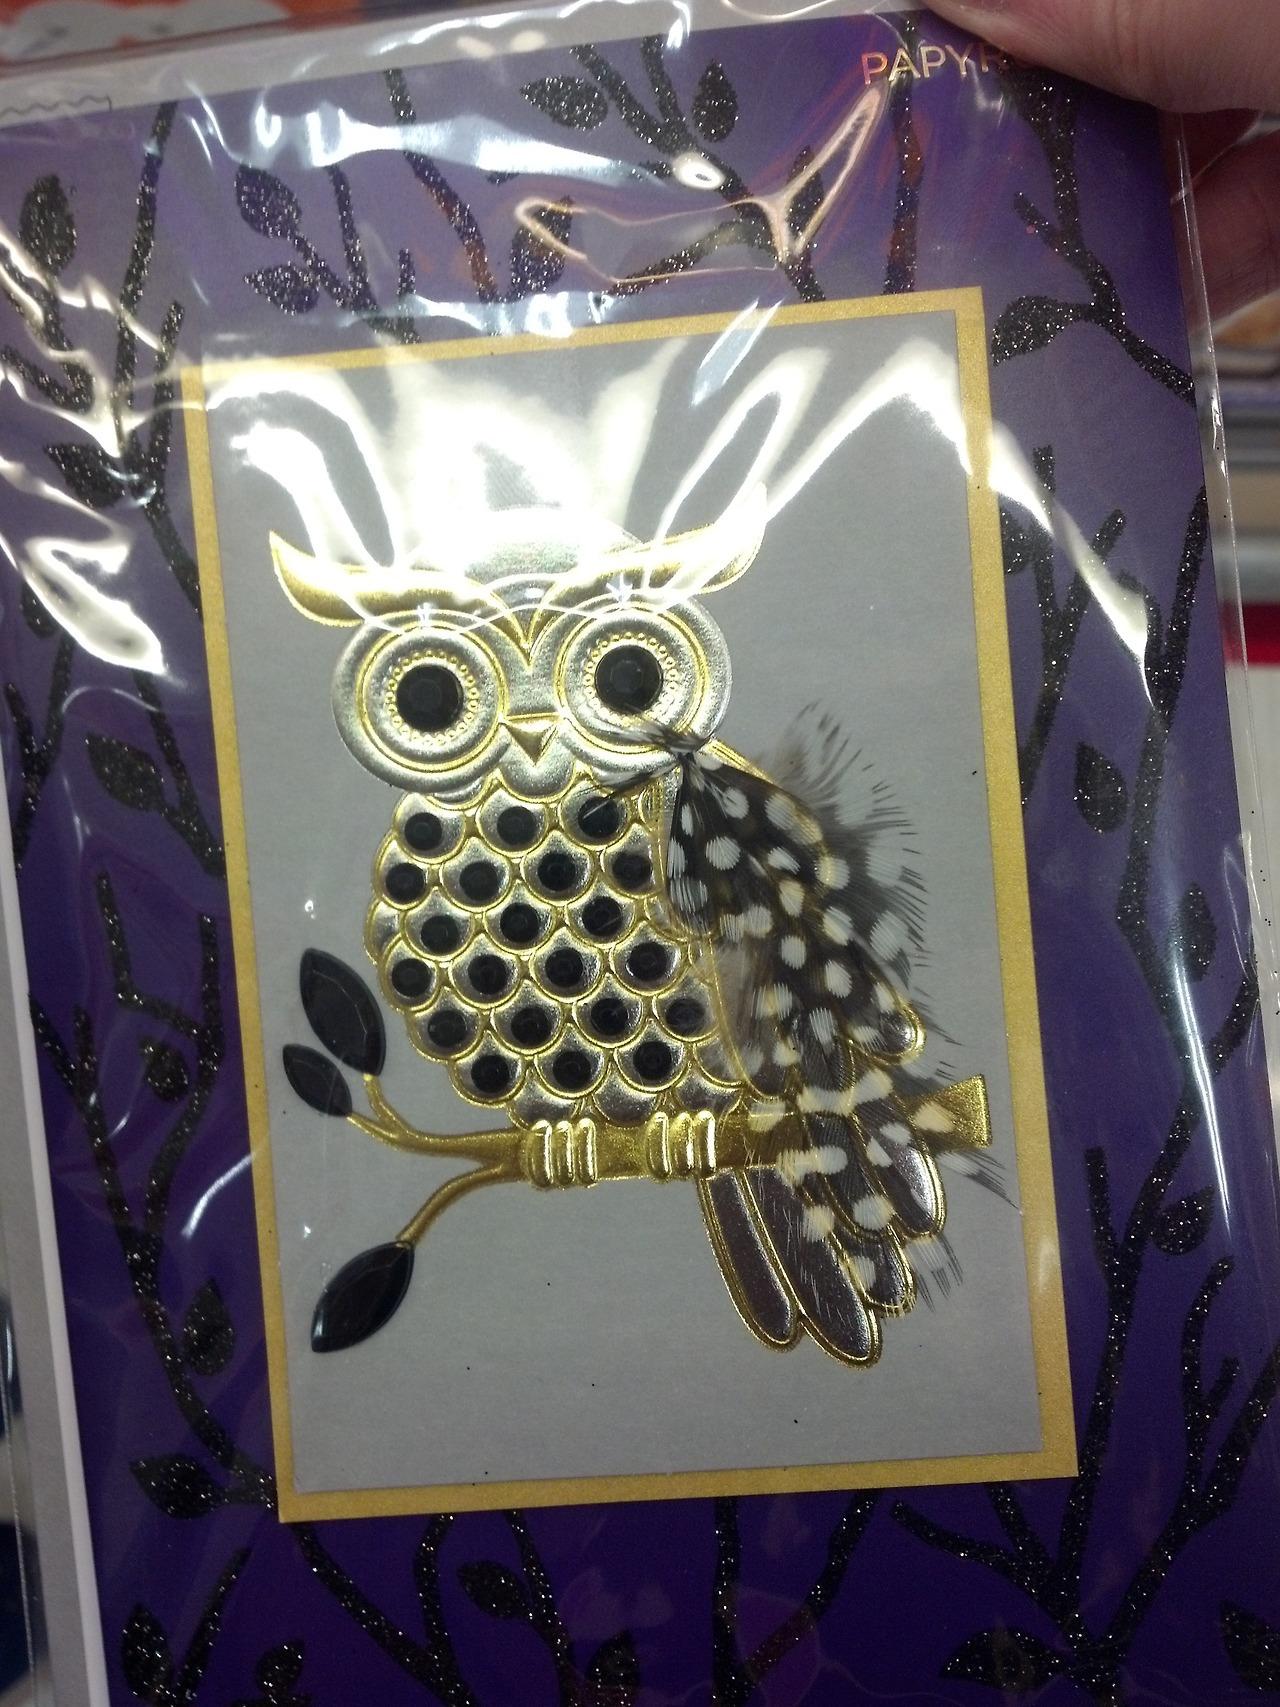 #halloween card#owls#halloween owl#halloween cards#halloween decorations#my photo#my post